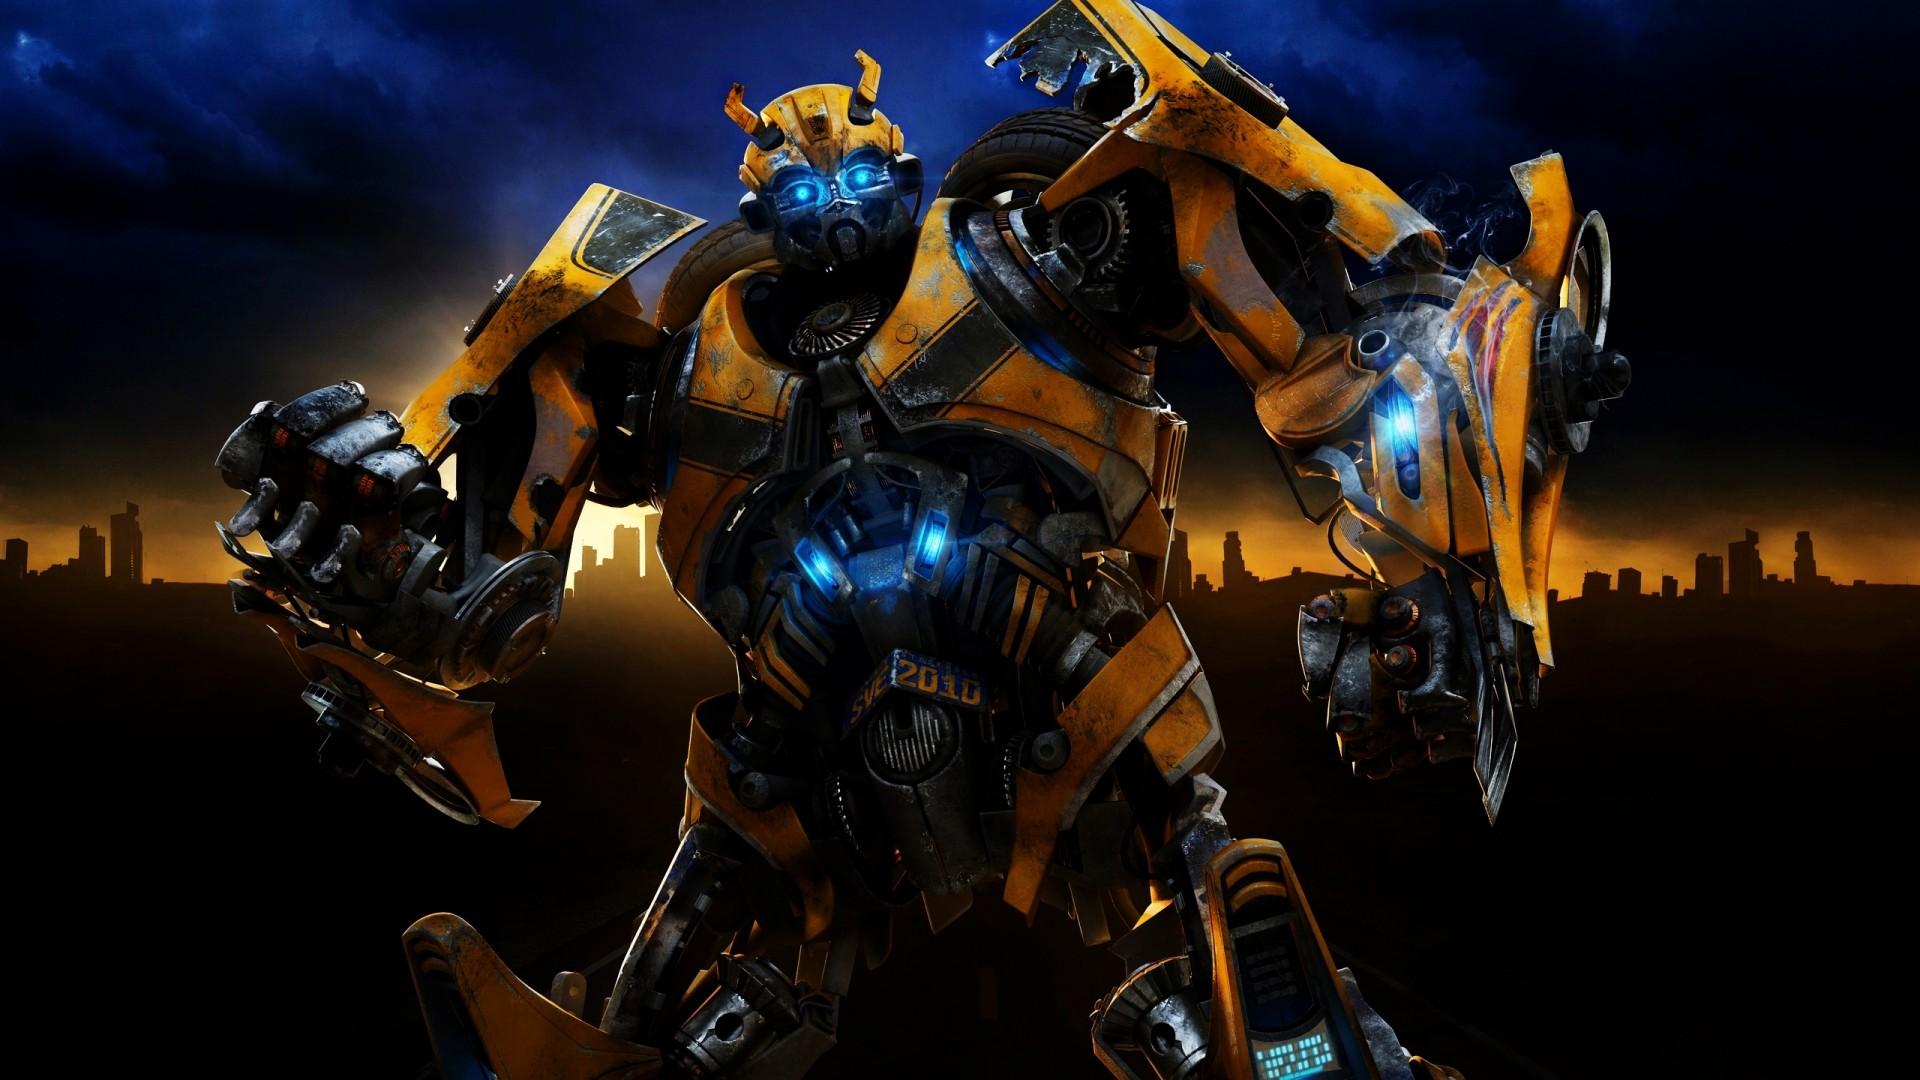 Transformers 1080p Wallpapers – Wallpaper, High Definition, High .